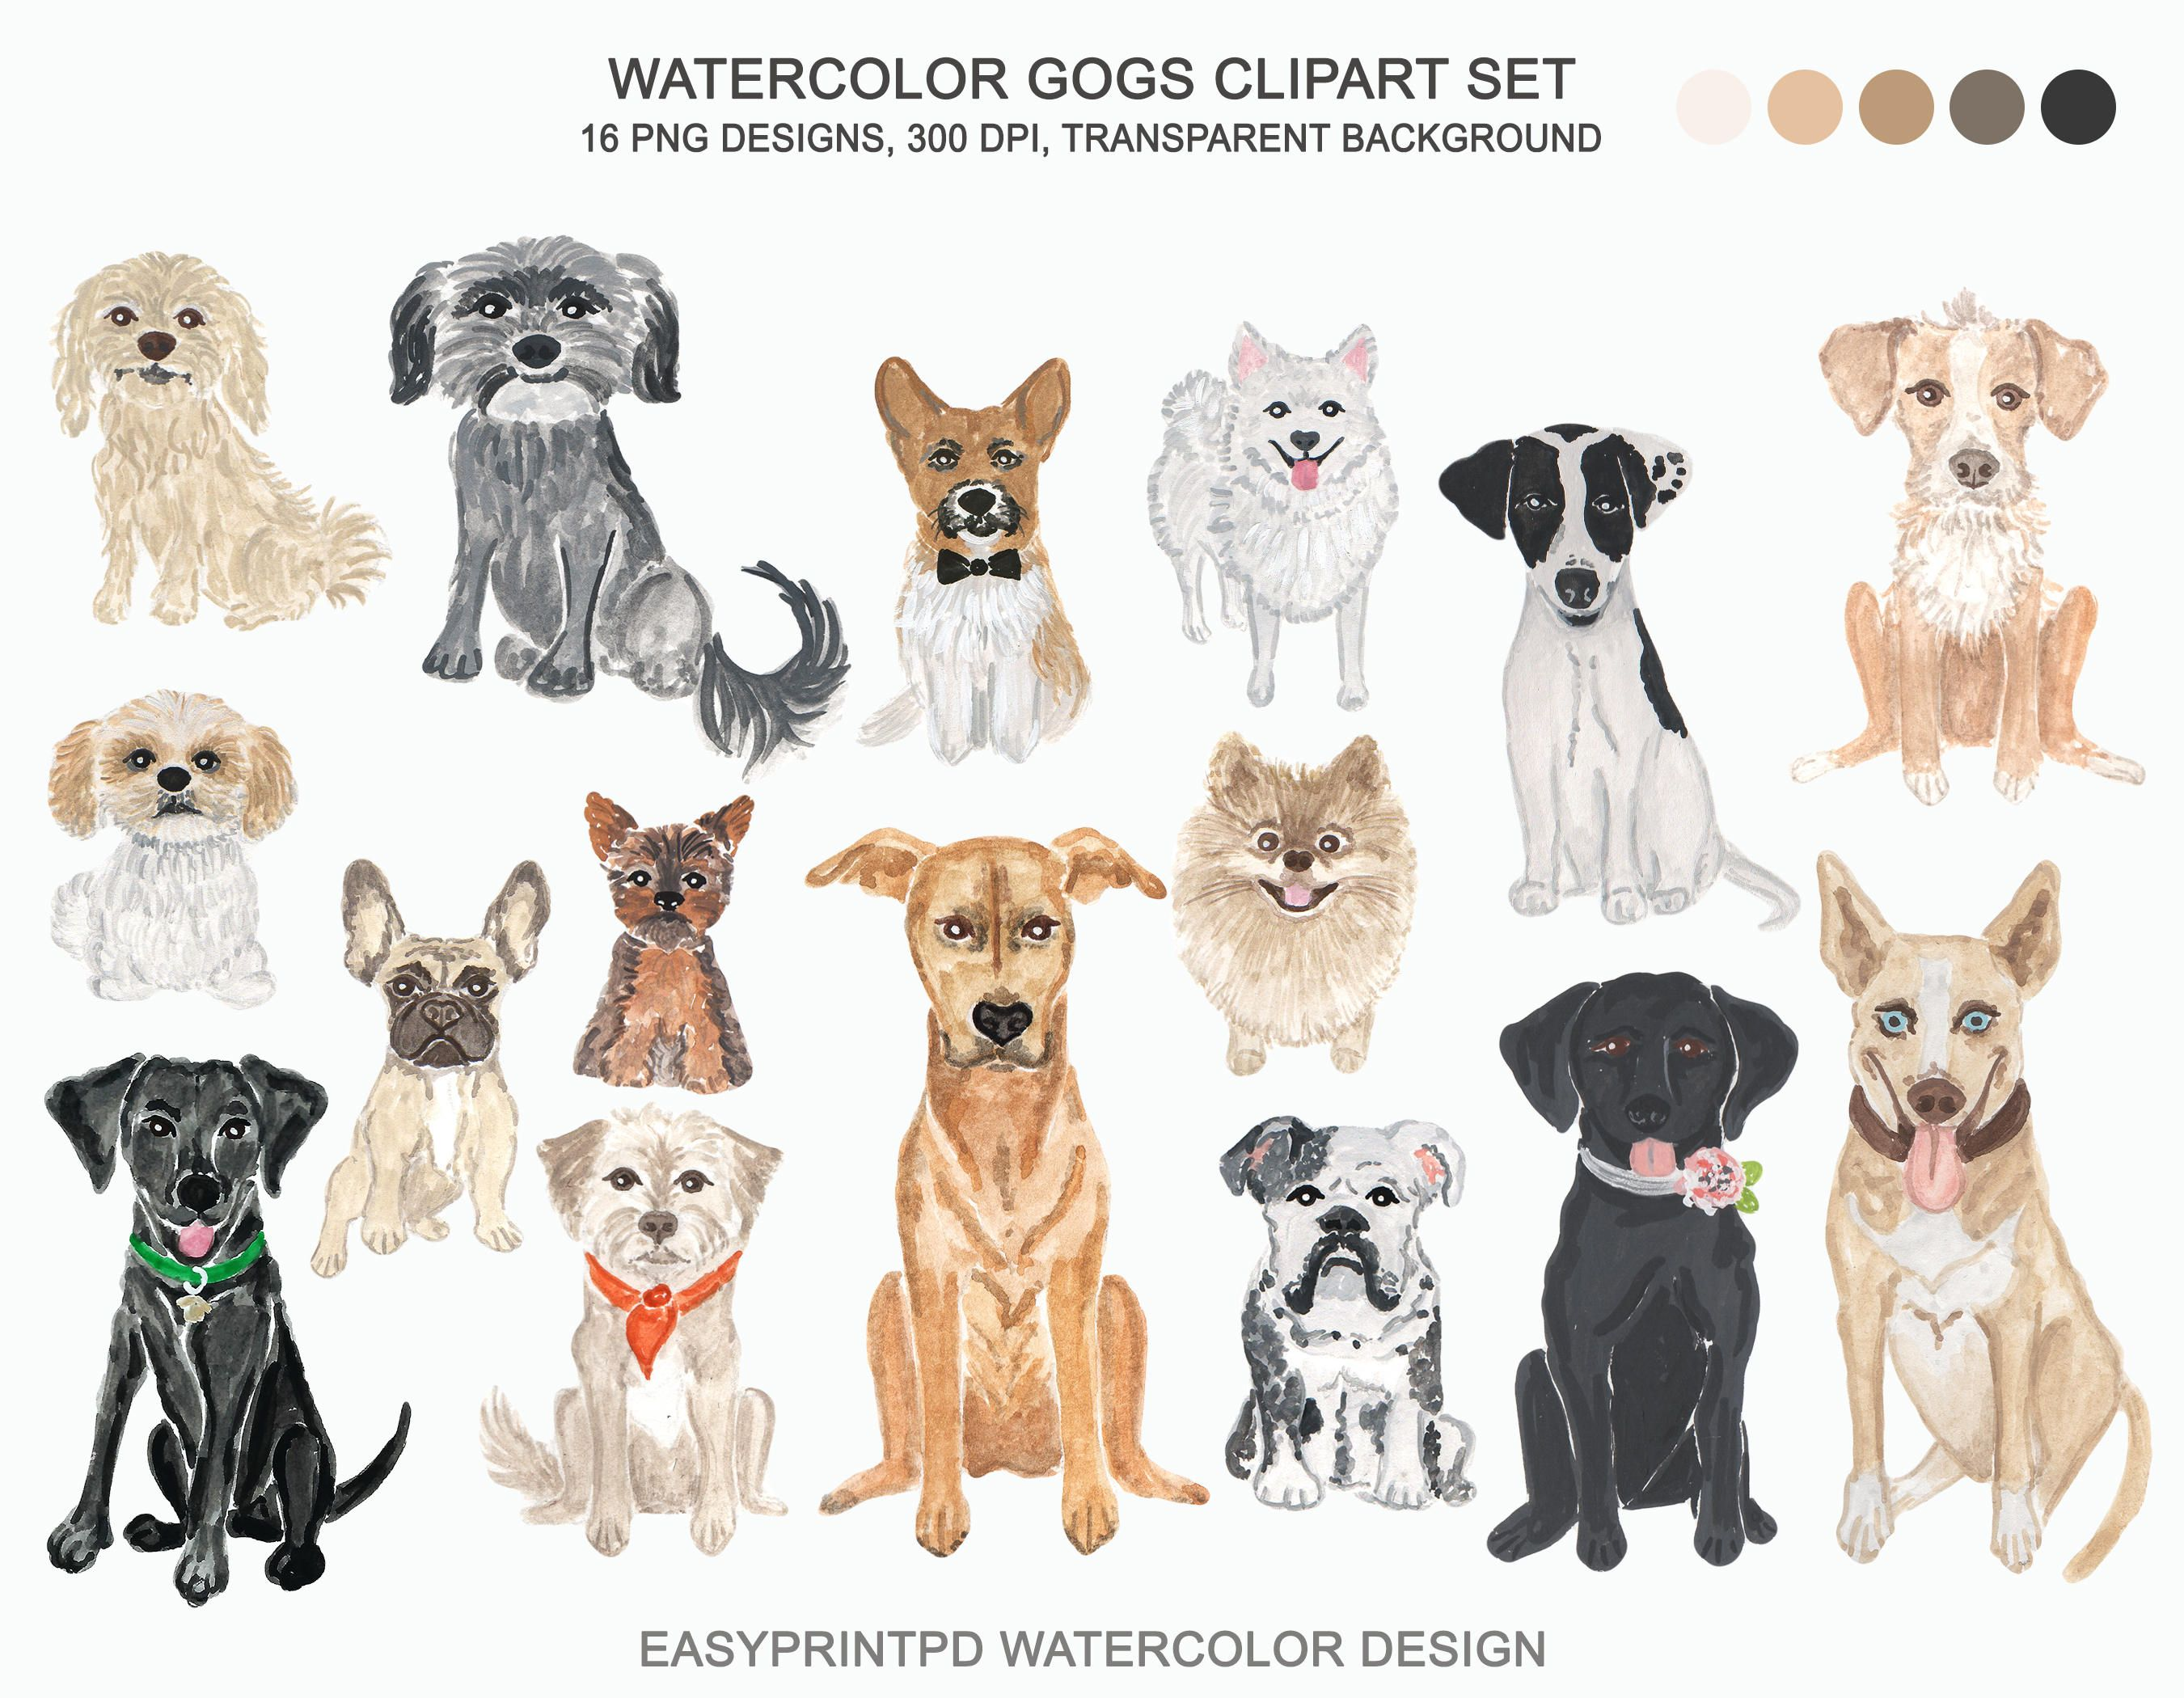 Watercolor Dogs Clipart Pets Clip Art Watercolor Animals